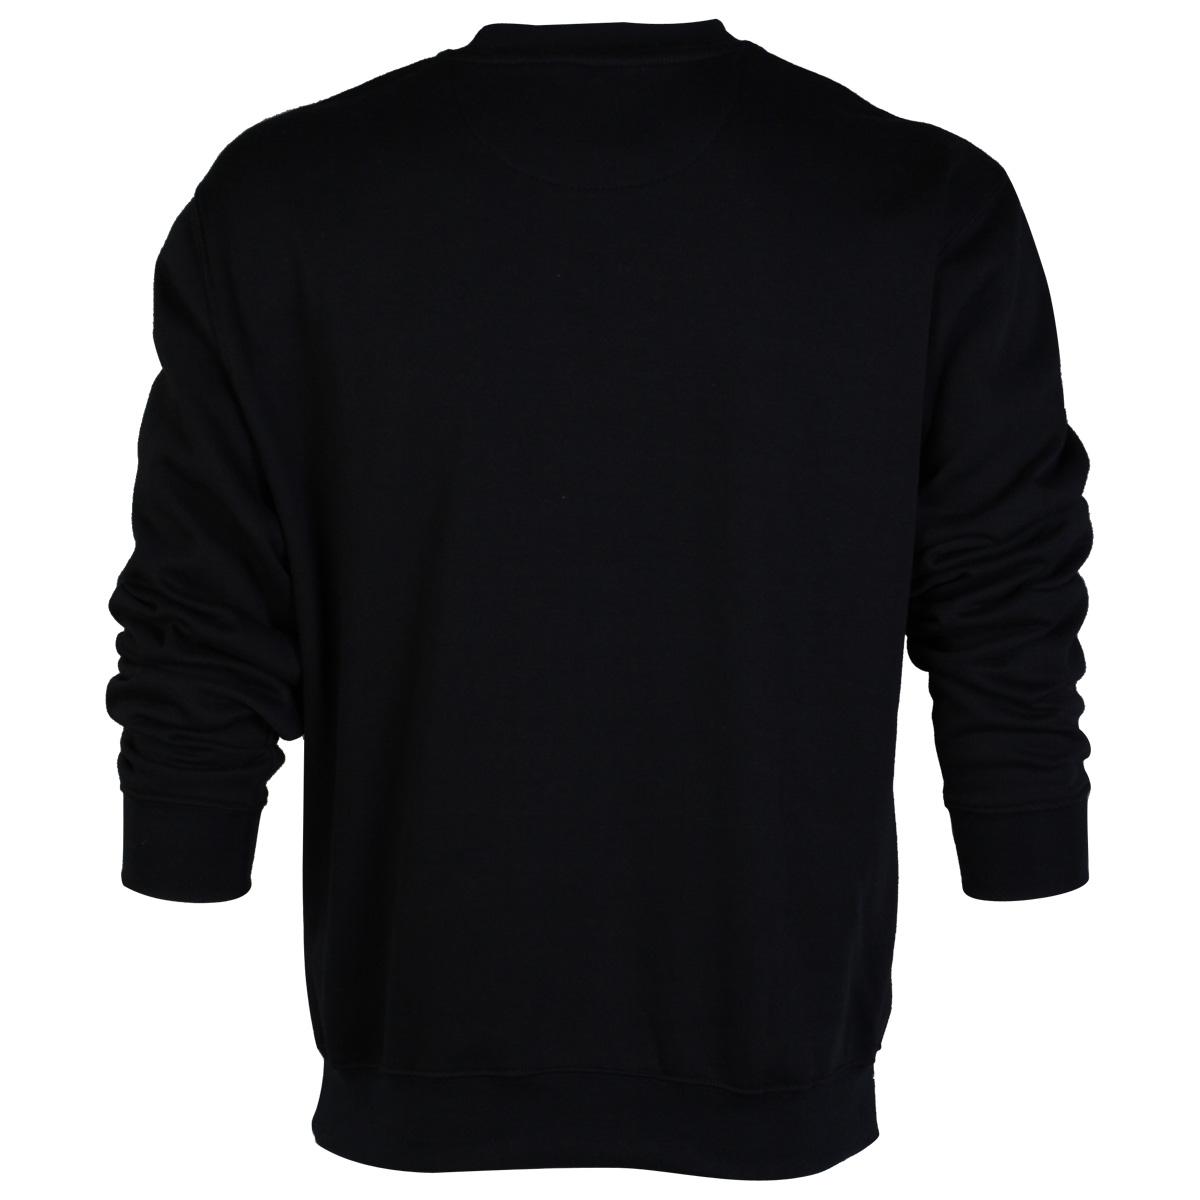 sweatshirt template psd